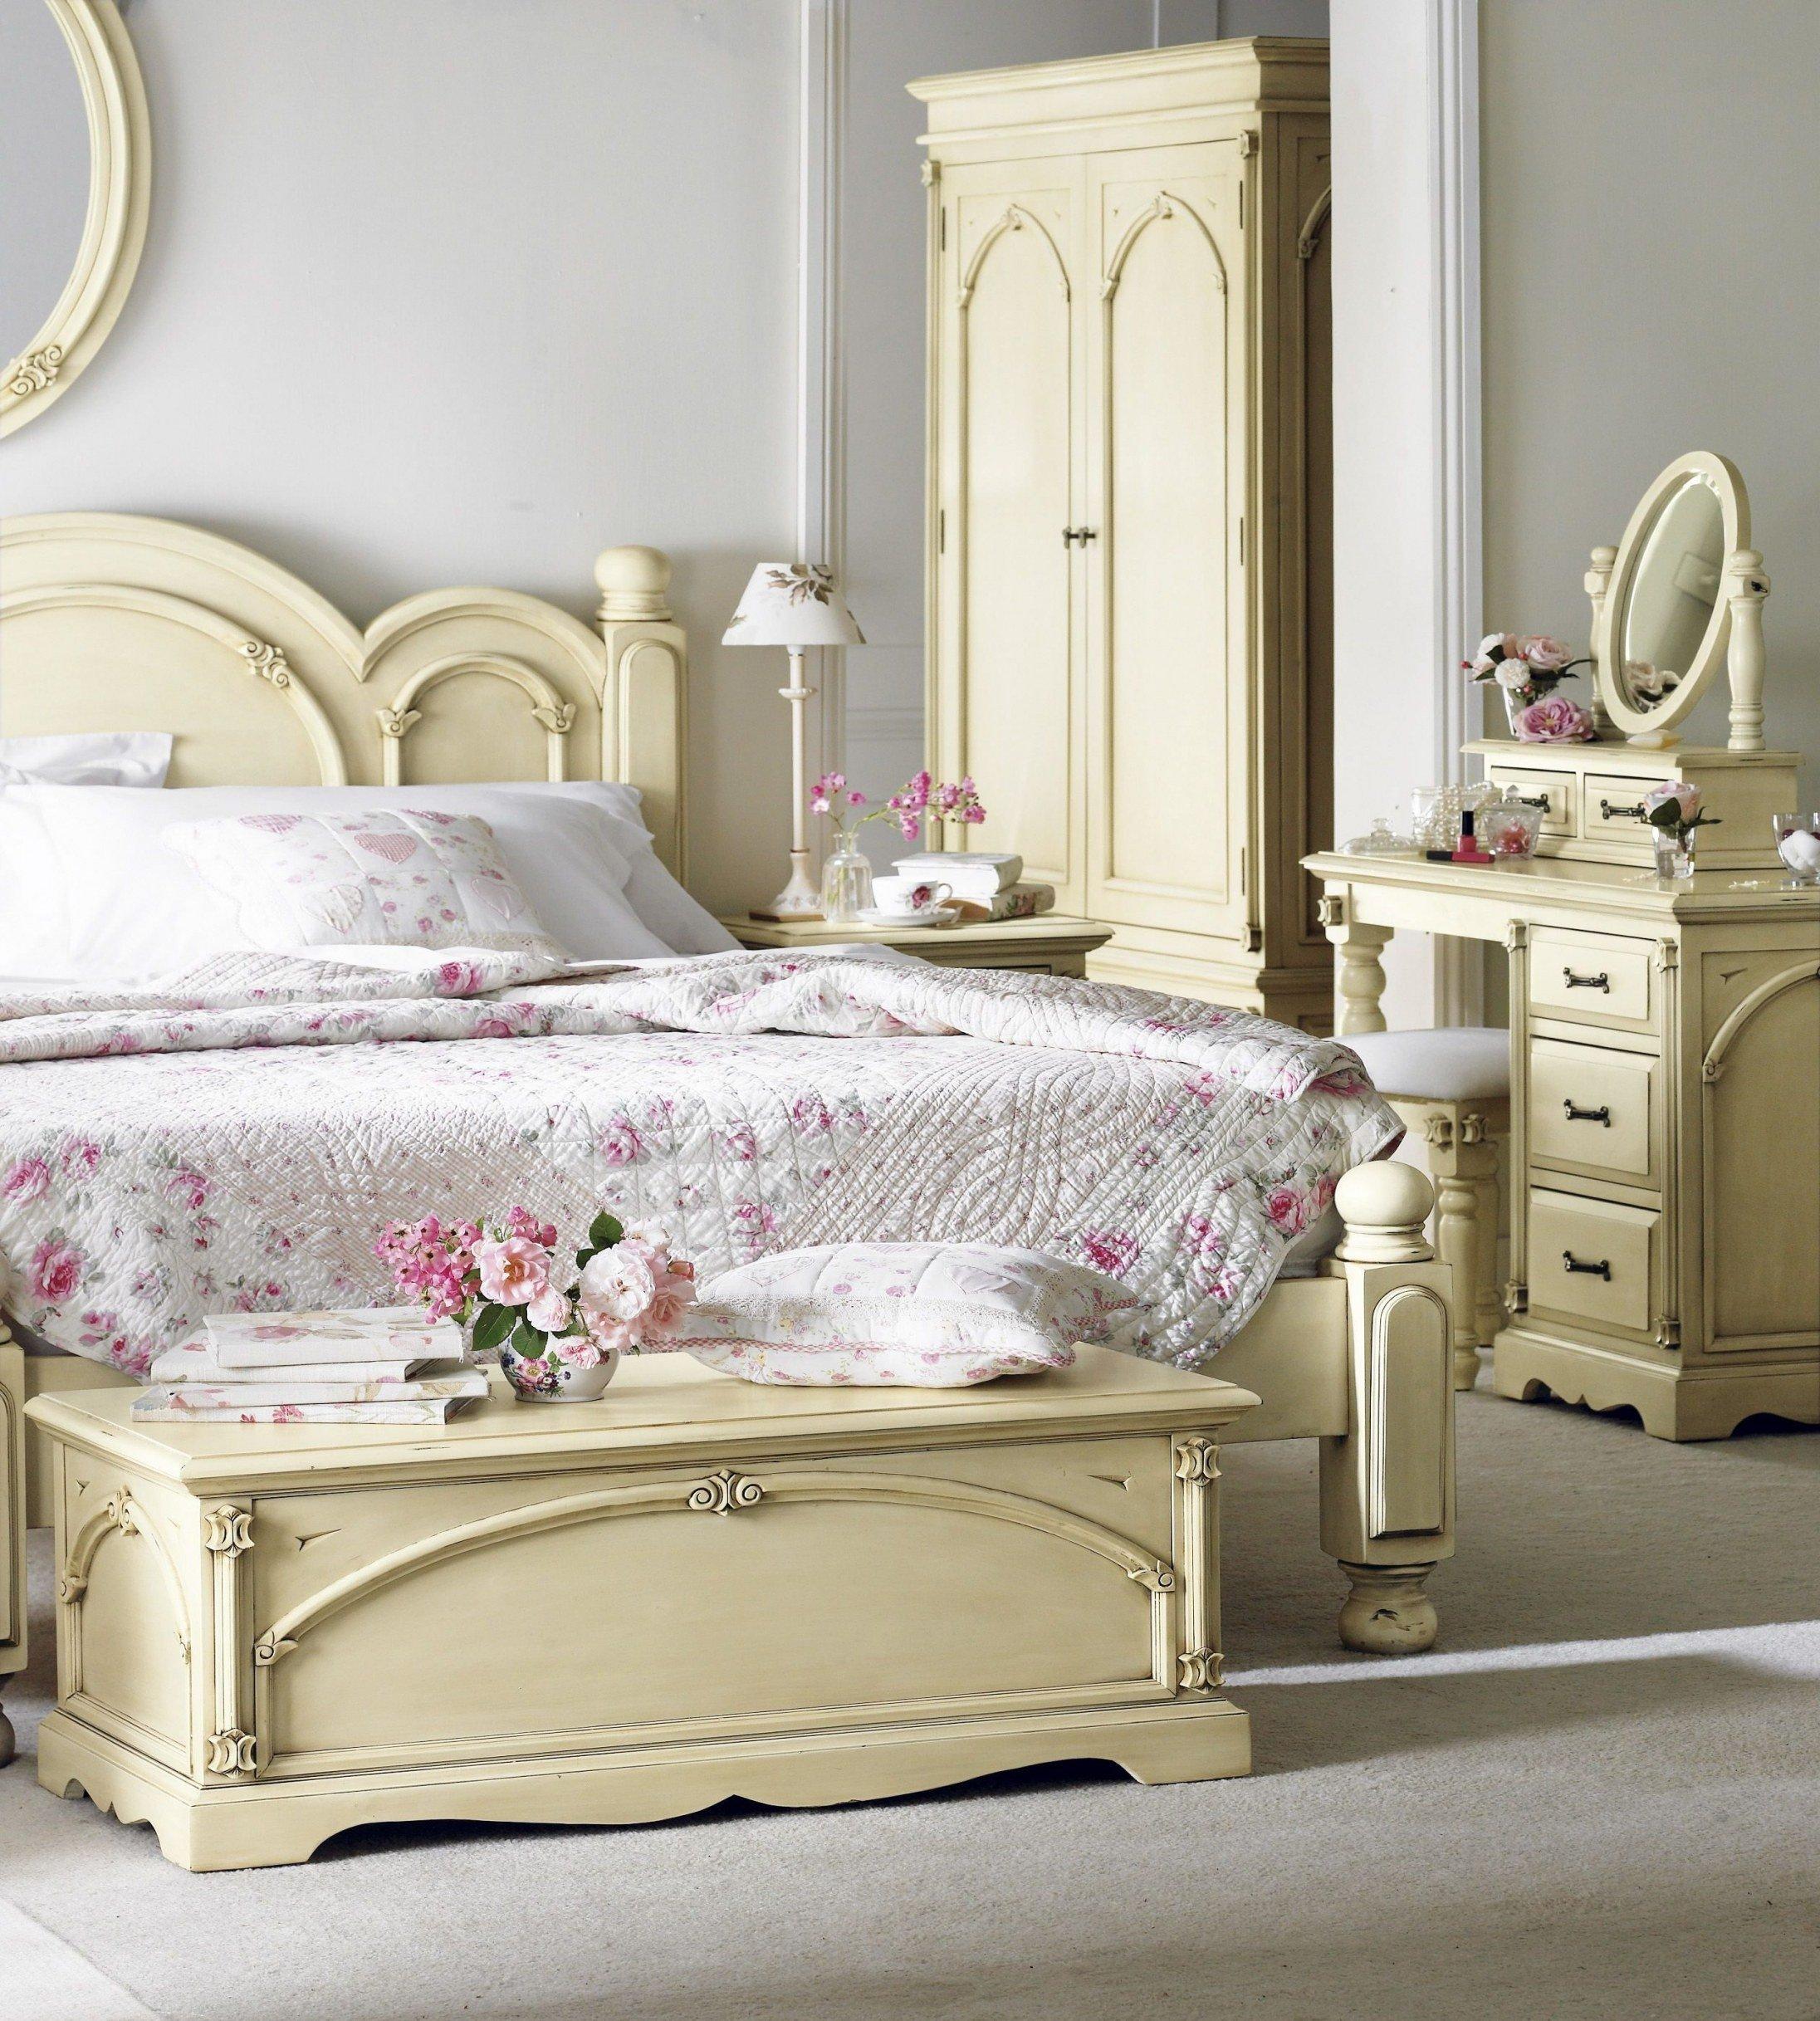 Teen Girl Bedroom Decor Inspirational Teen Girls Bedroom Ideas Bedroom Cool Gray Bedroom Decor